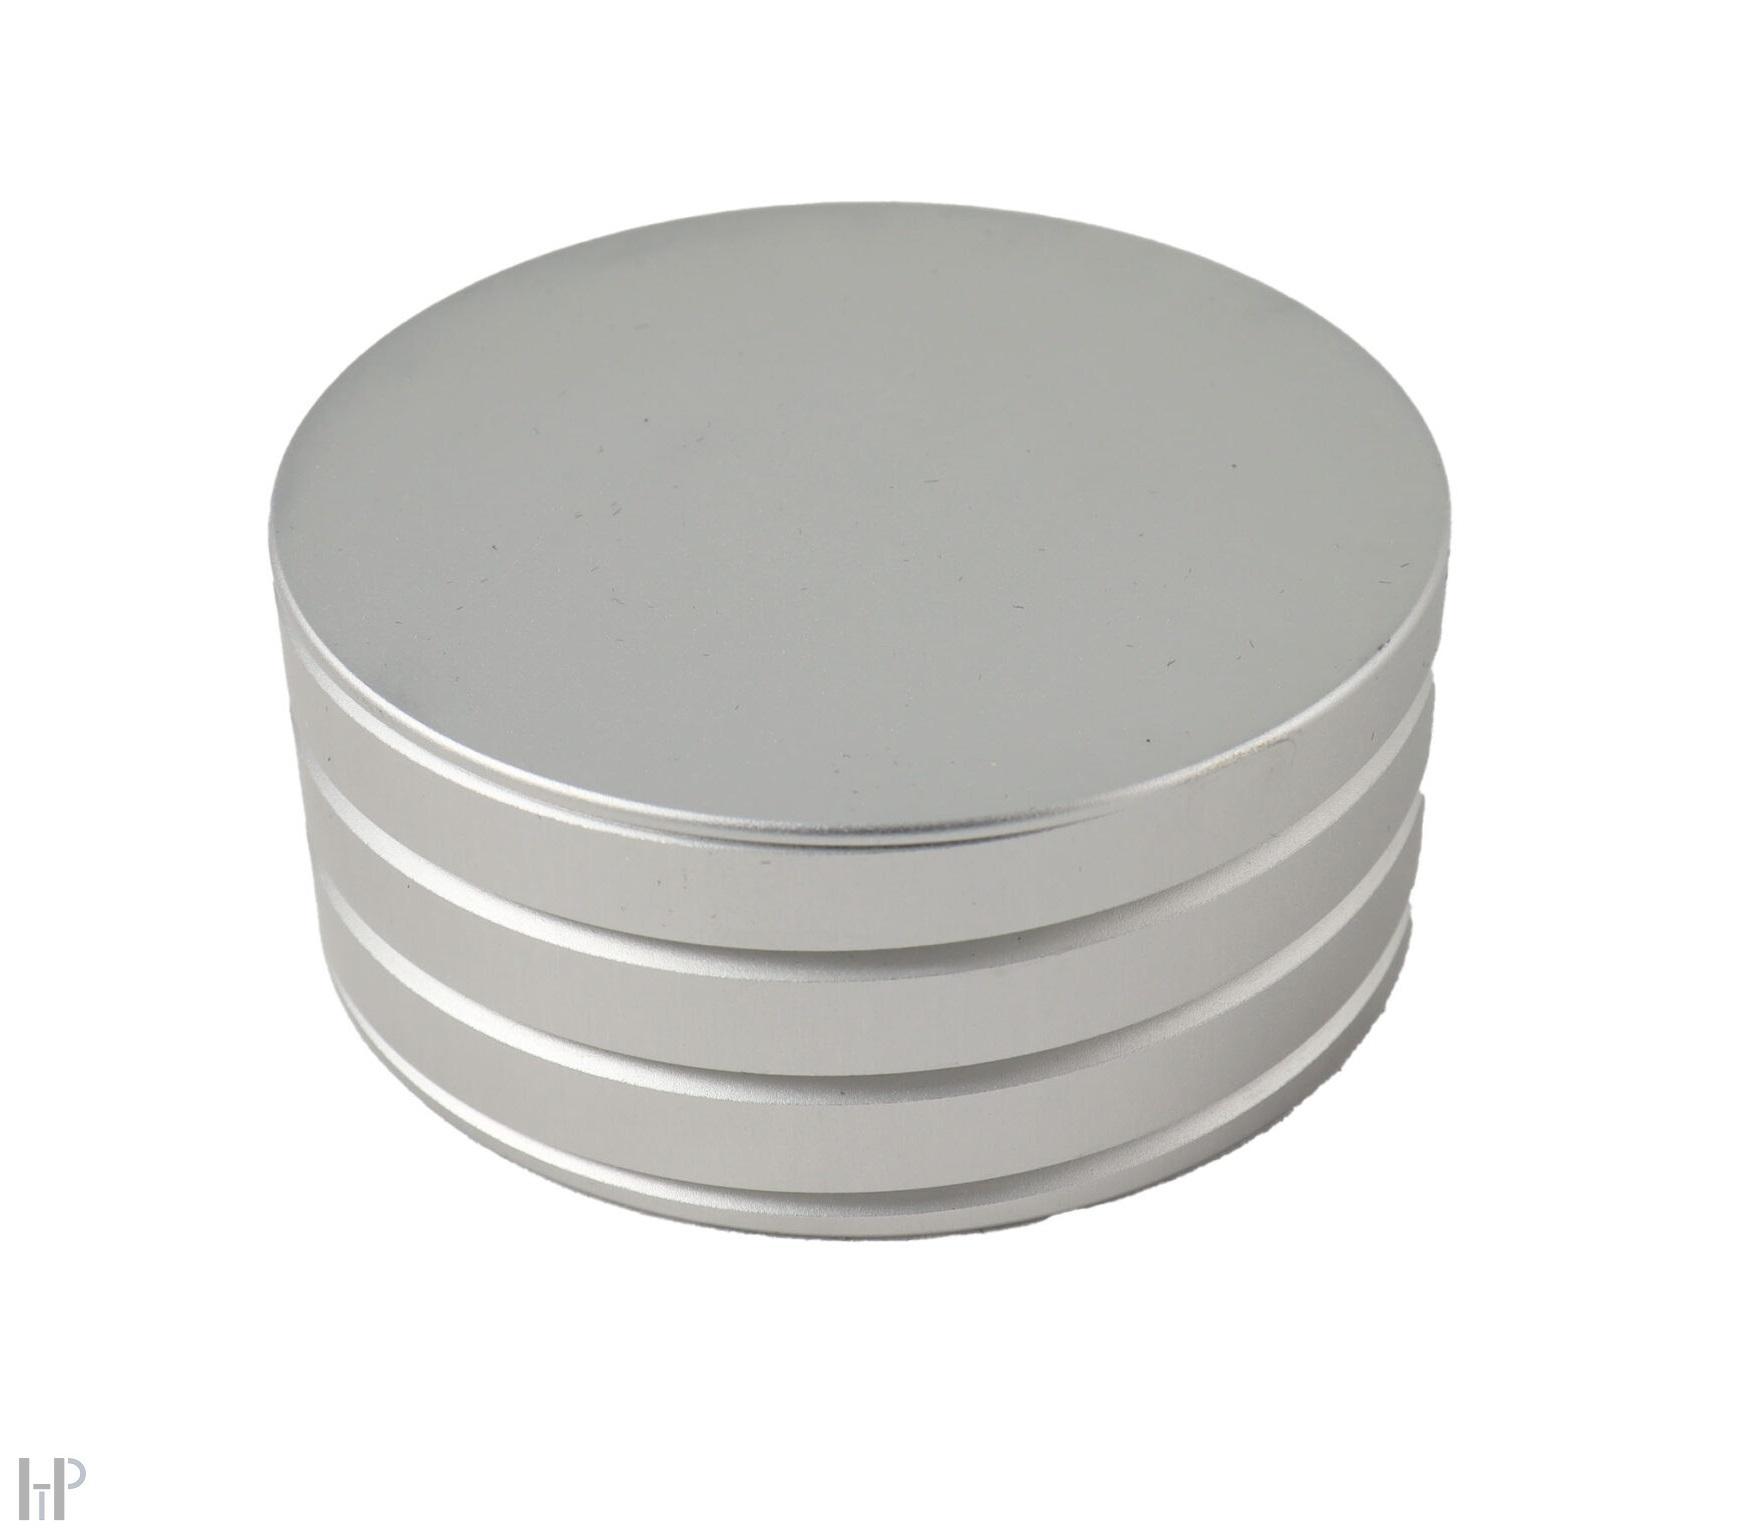 Ludic - Titran Record Stabilizer Aluminium Barevné provedení: černé